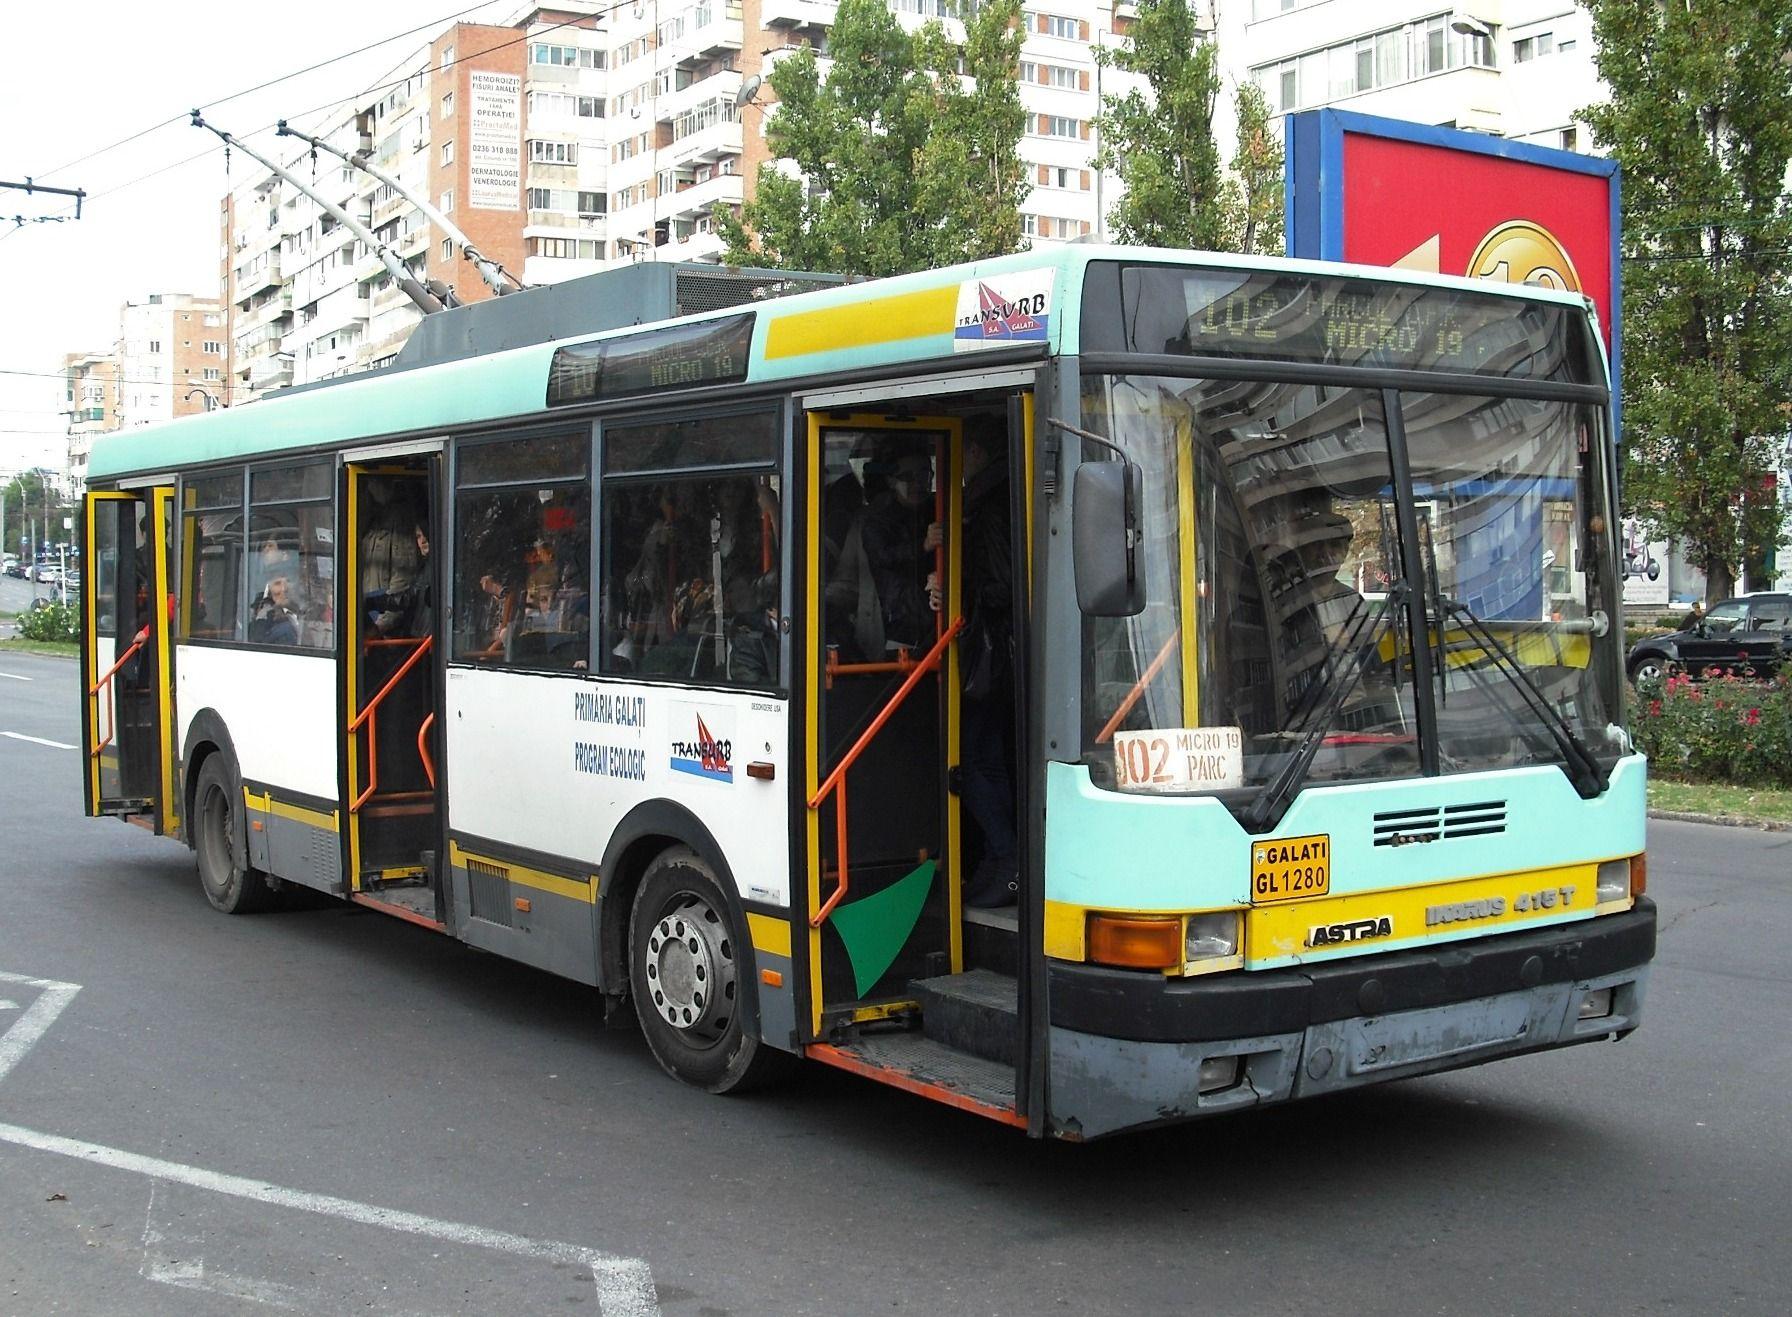 1280-102-Dt-3